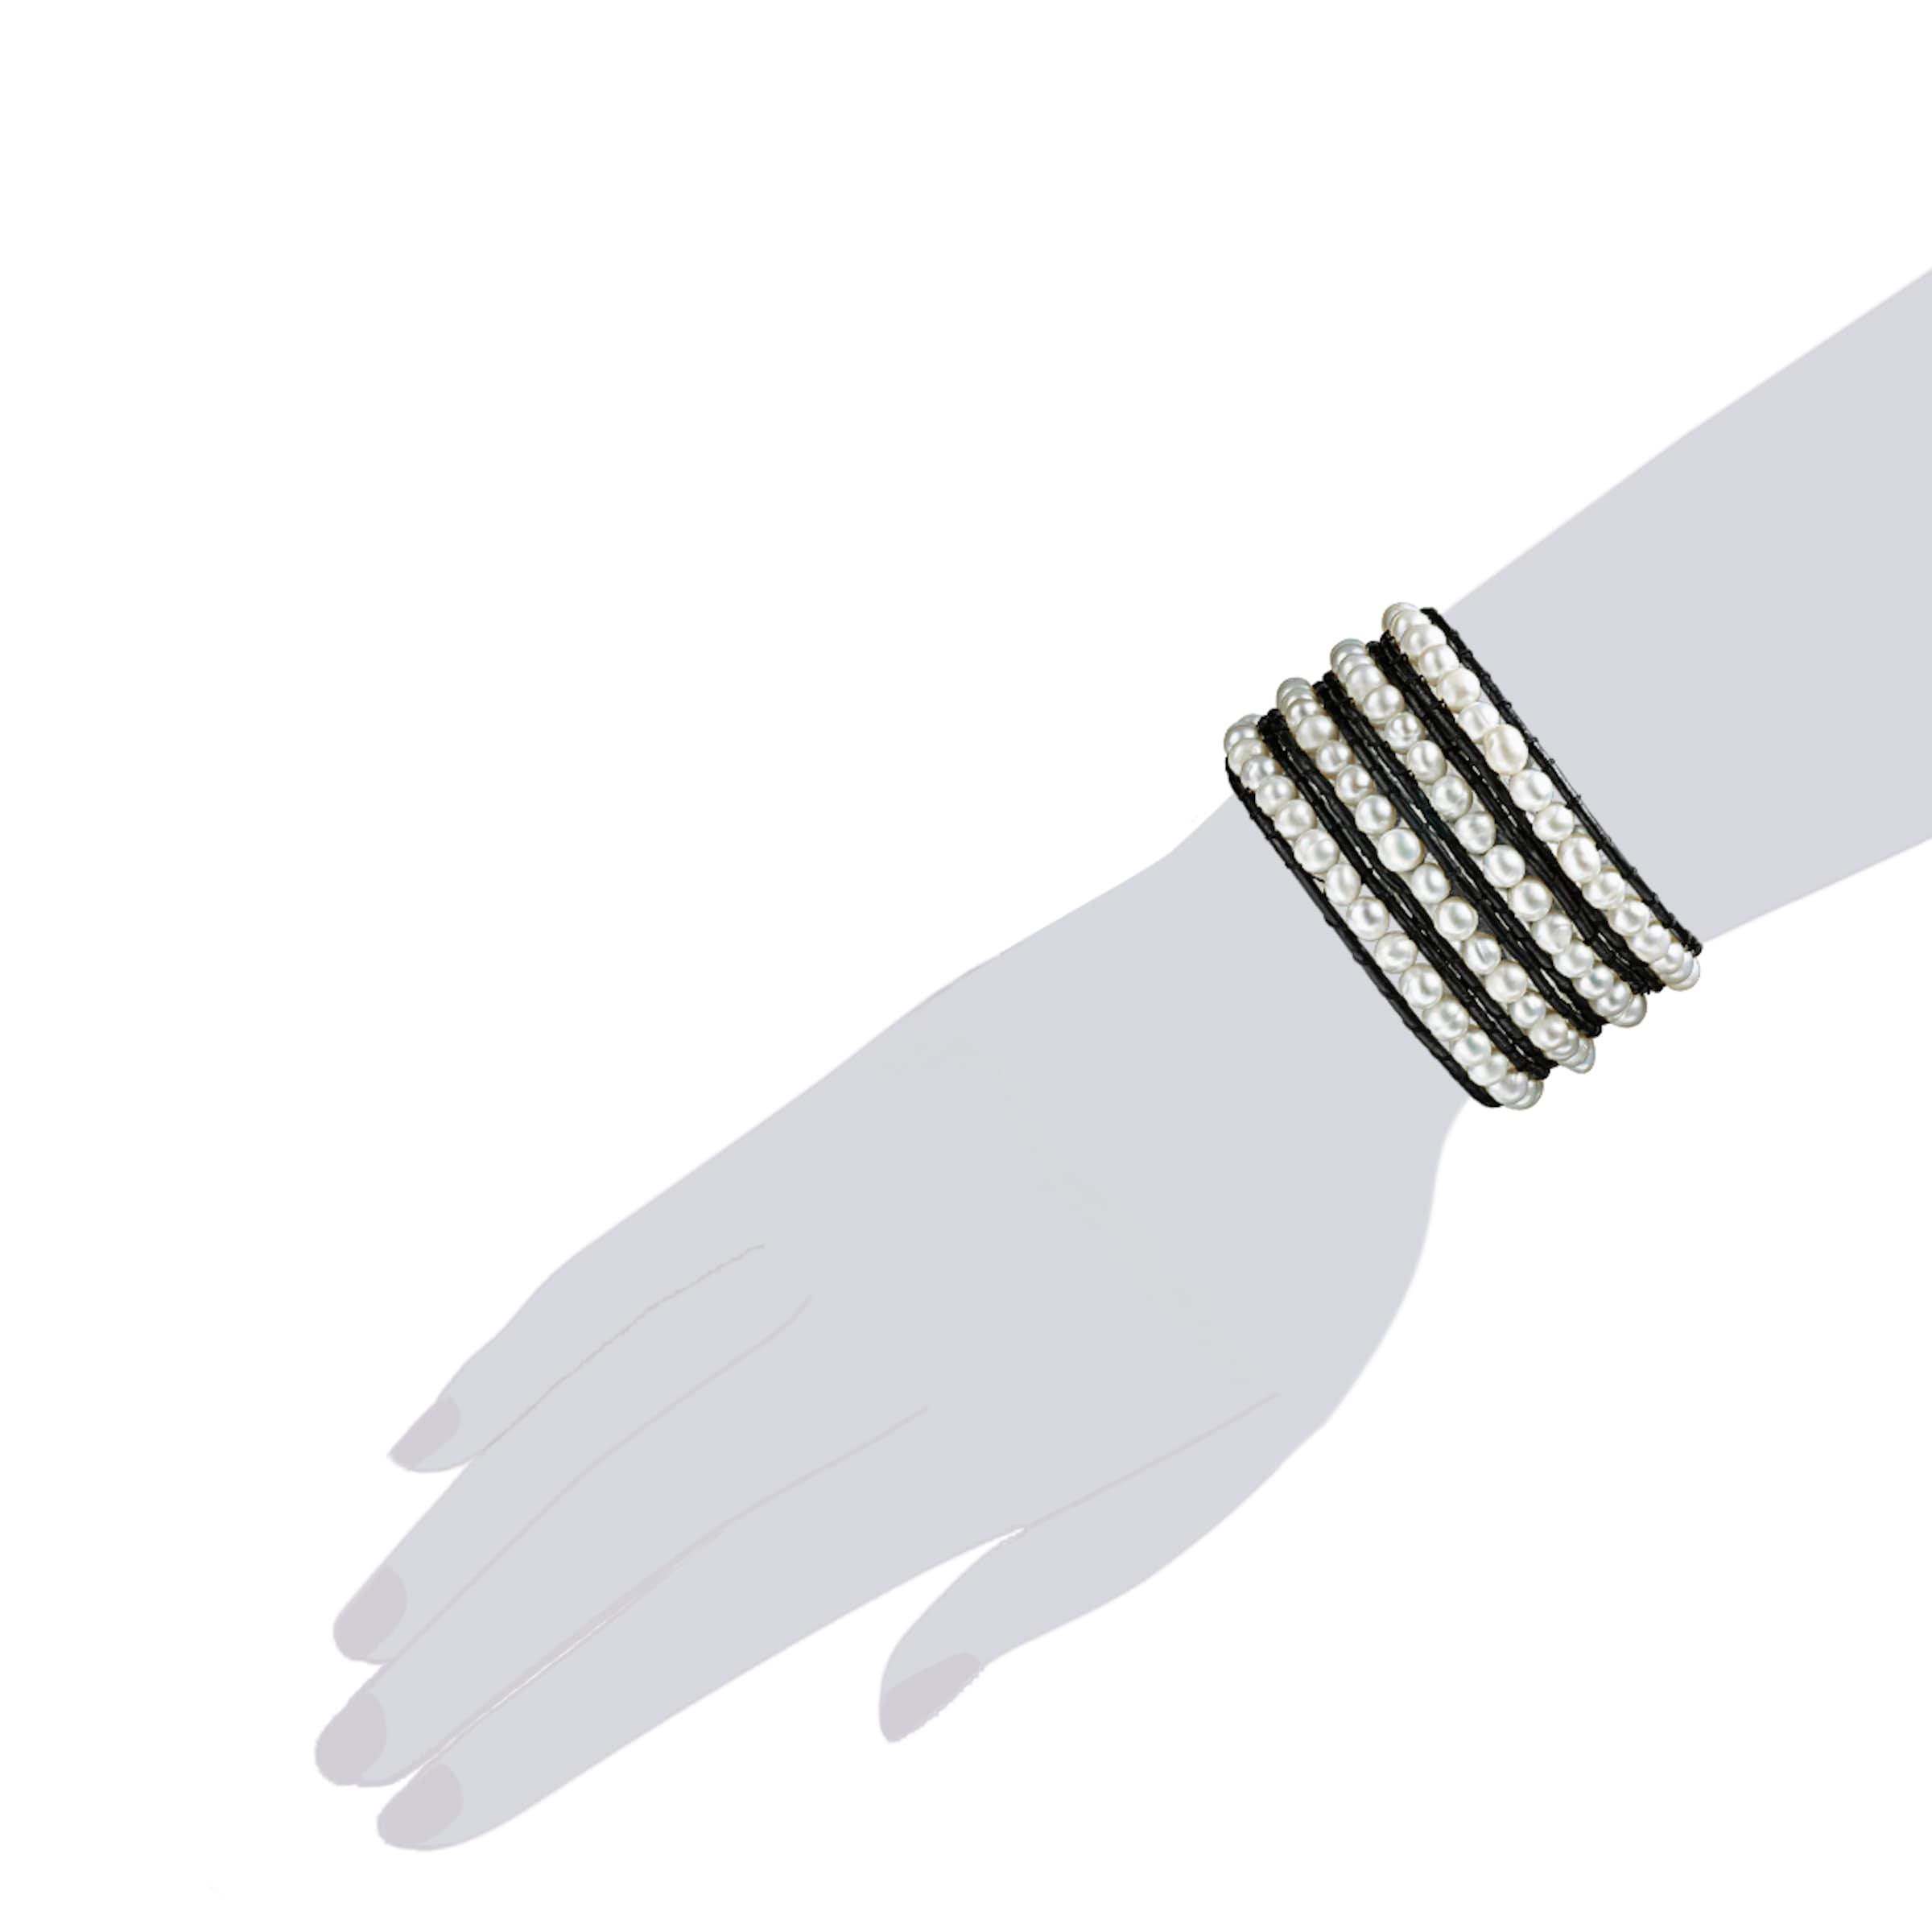 Neuesten Kollektionen Günstiger Preis Valero Pearls Armband Rabatt Niedrigsten Preis ZuamJG